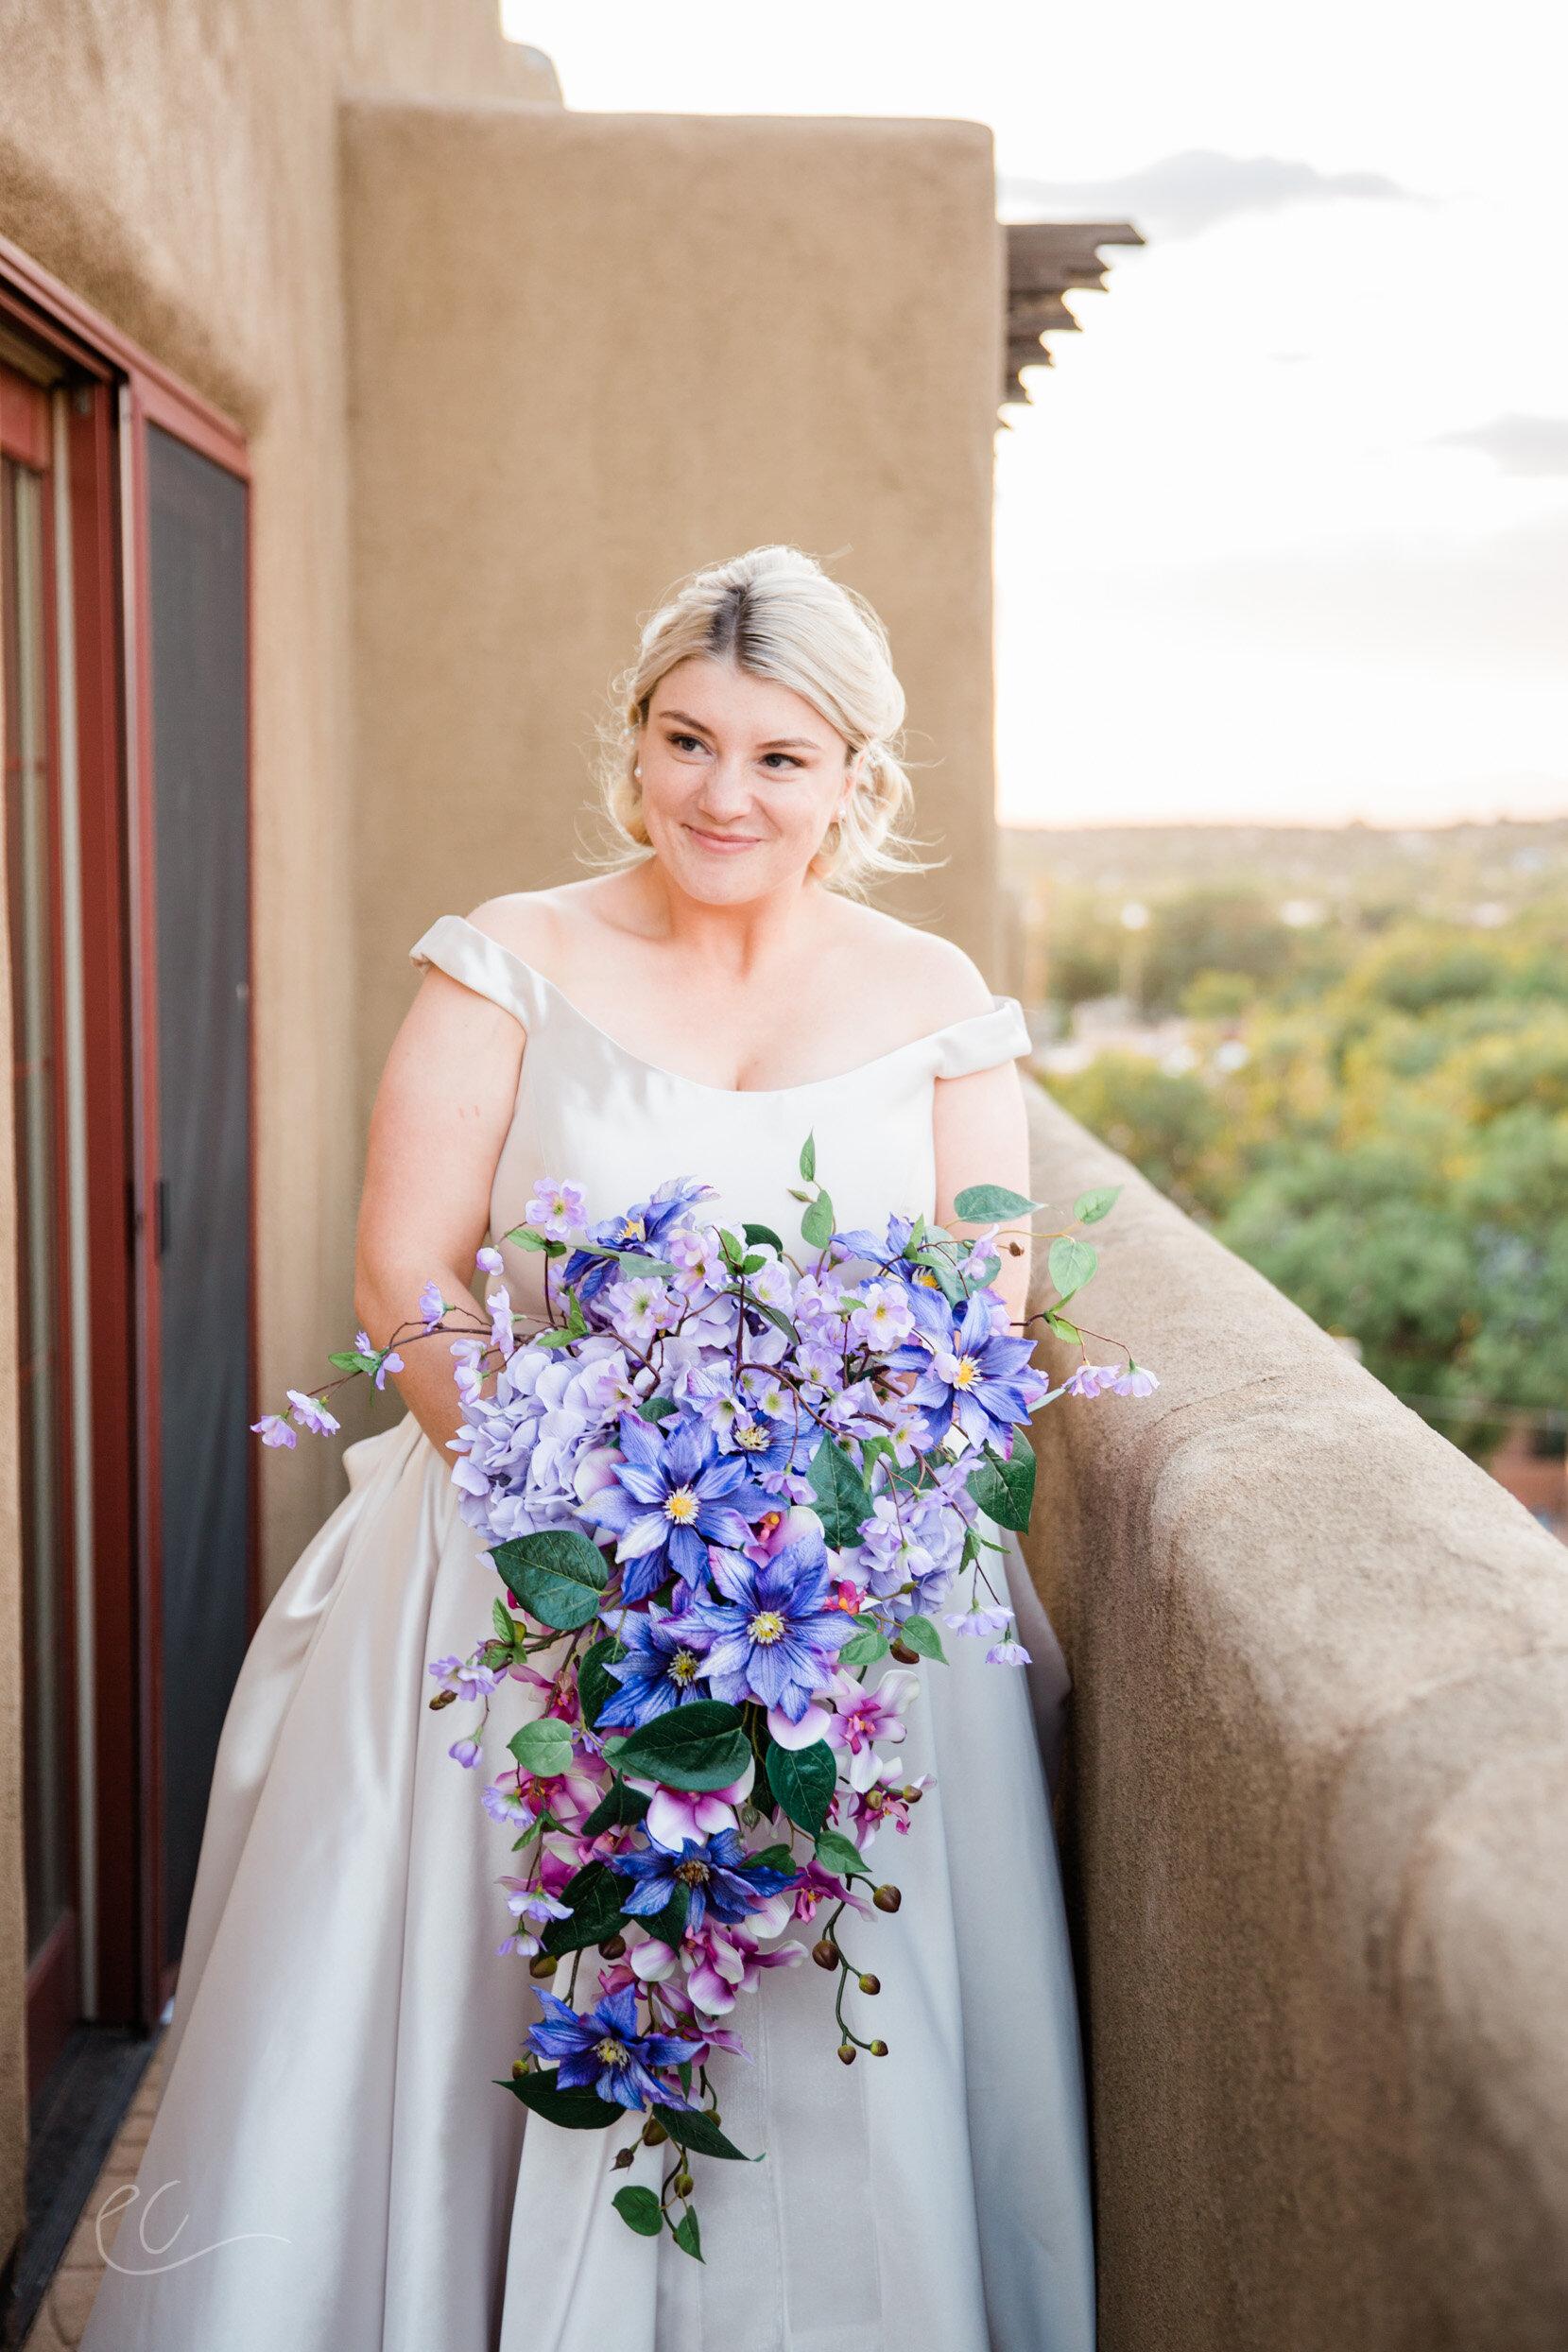 Santafe_wedding_photography_kellyzac-88.jpg